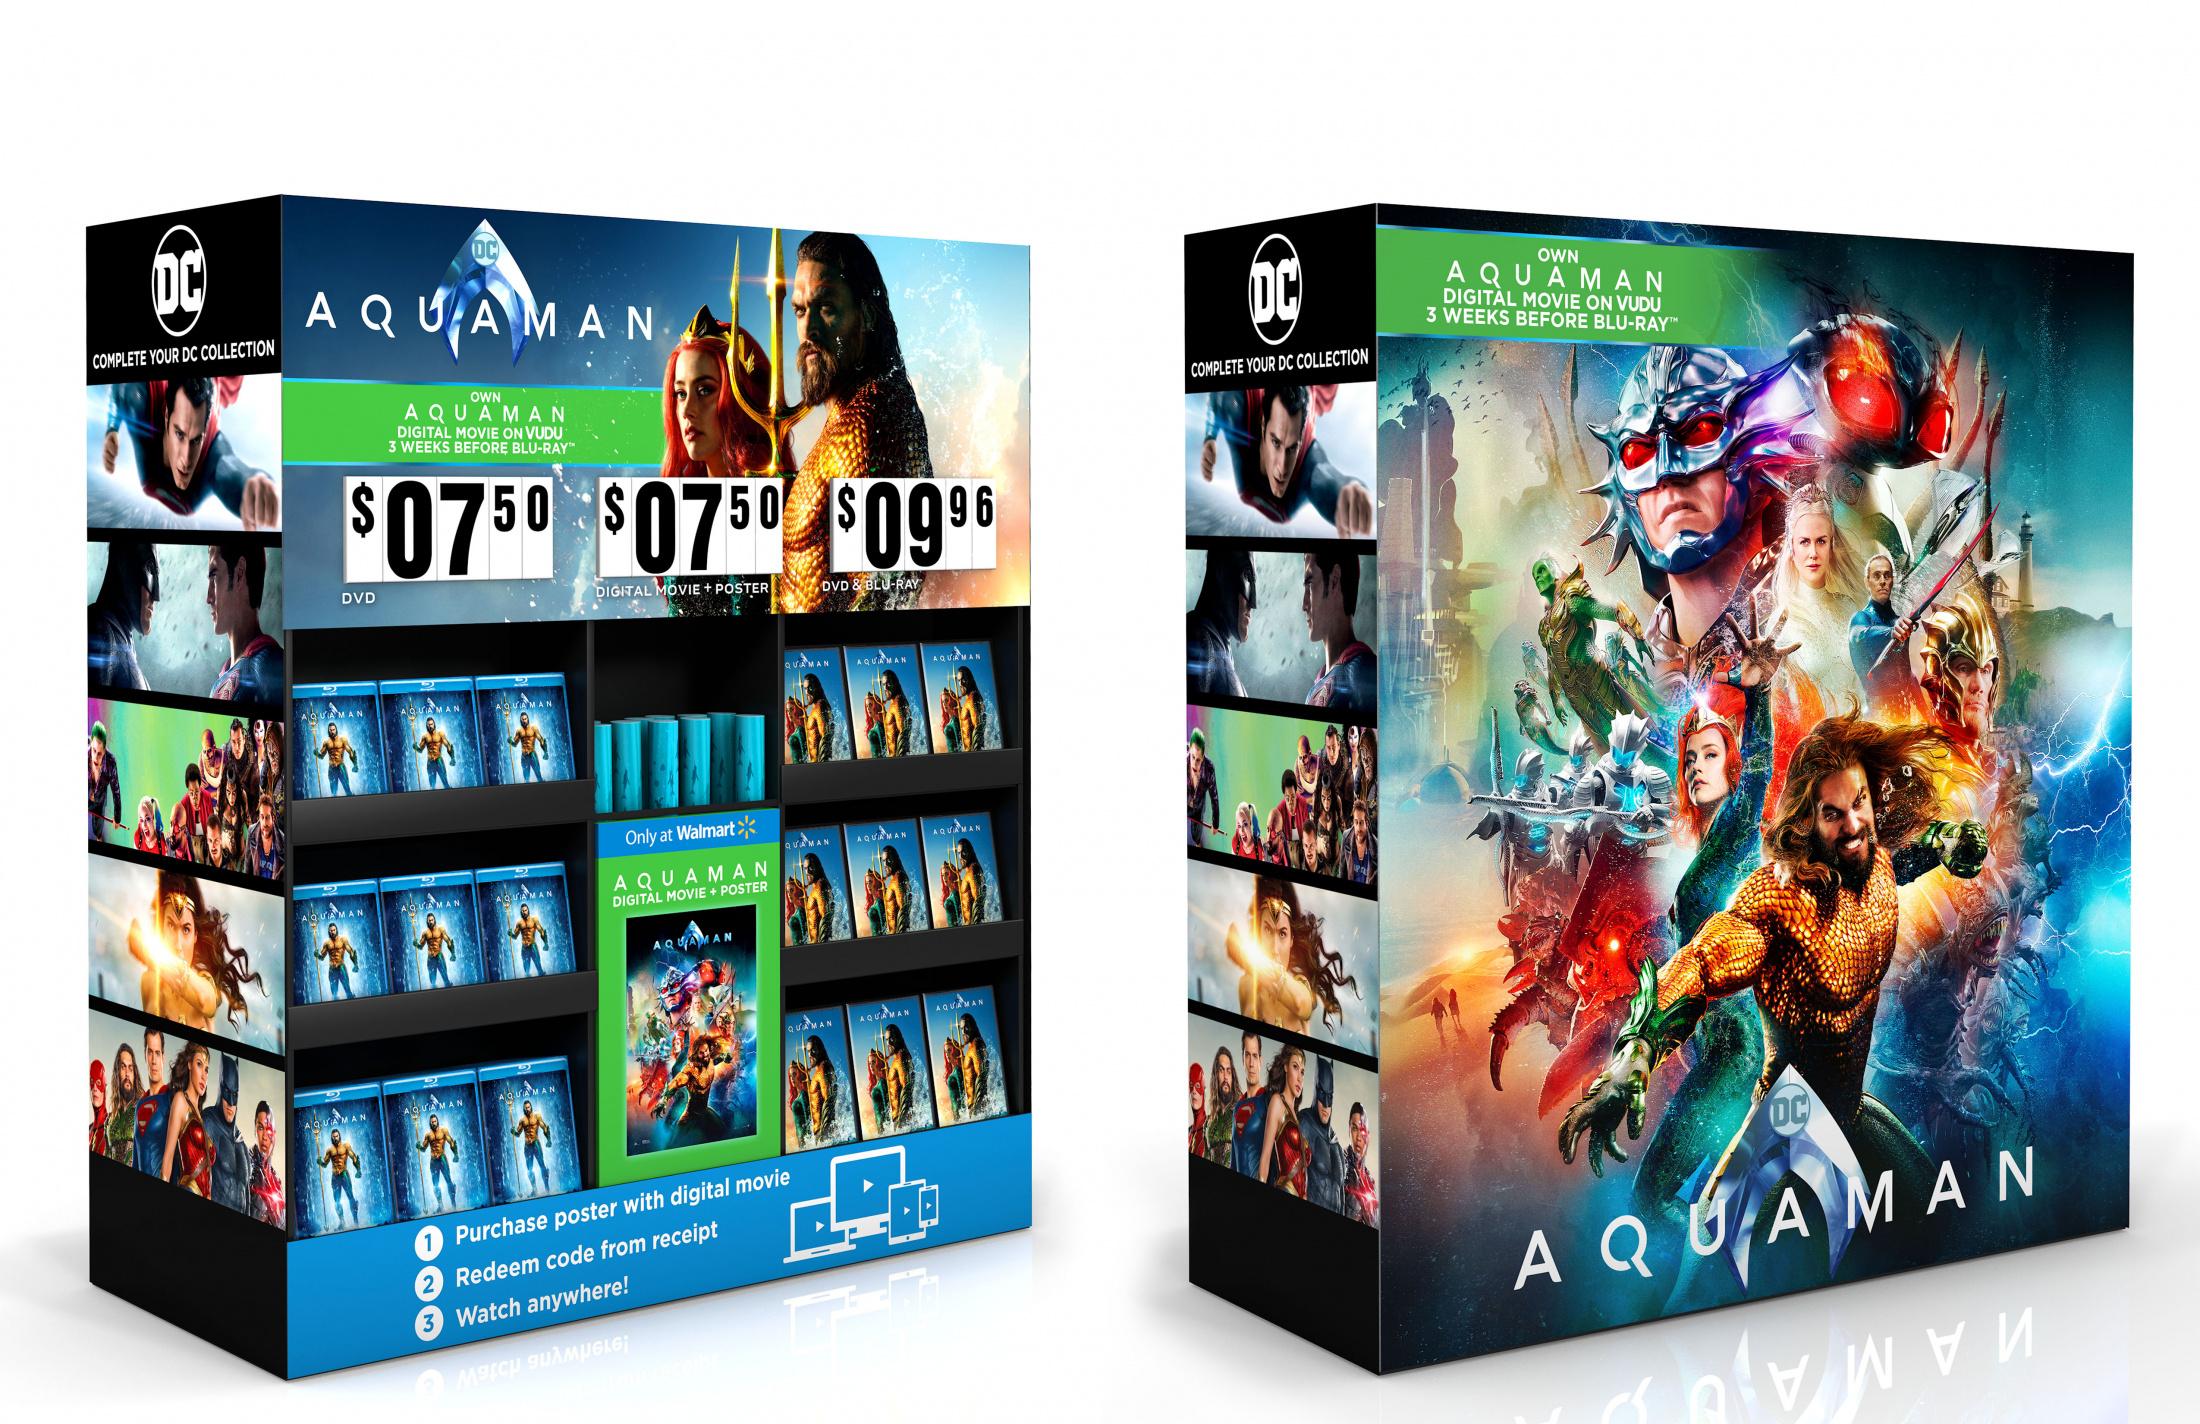 Thumbnail for Aquaman Home Entertainment Walmart Display Poster/Digital Cube